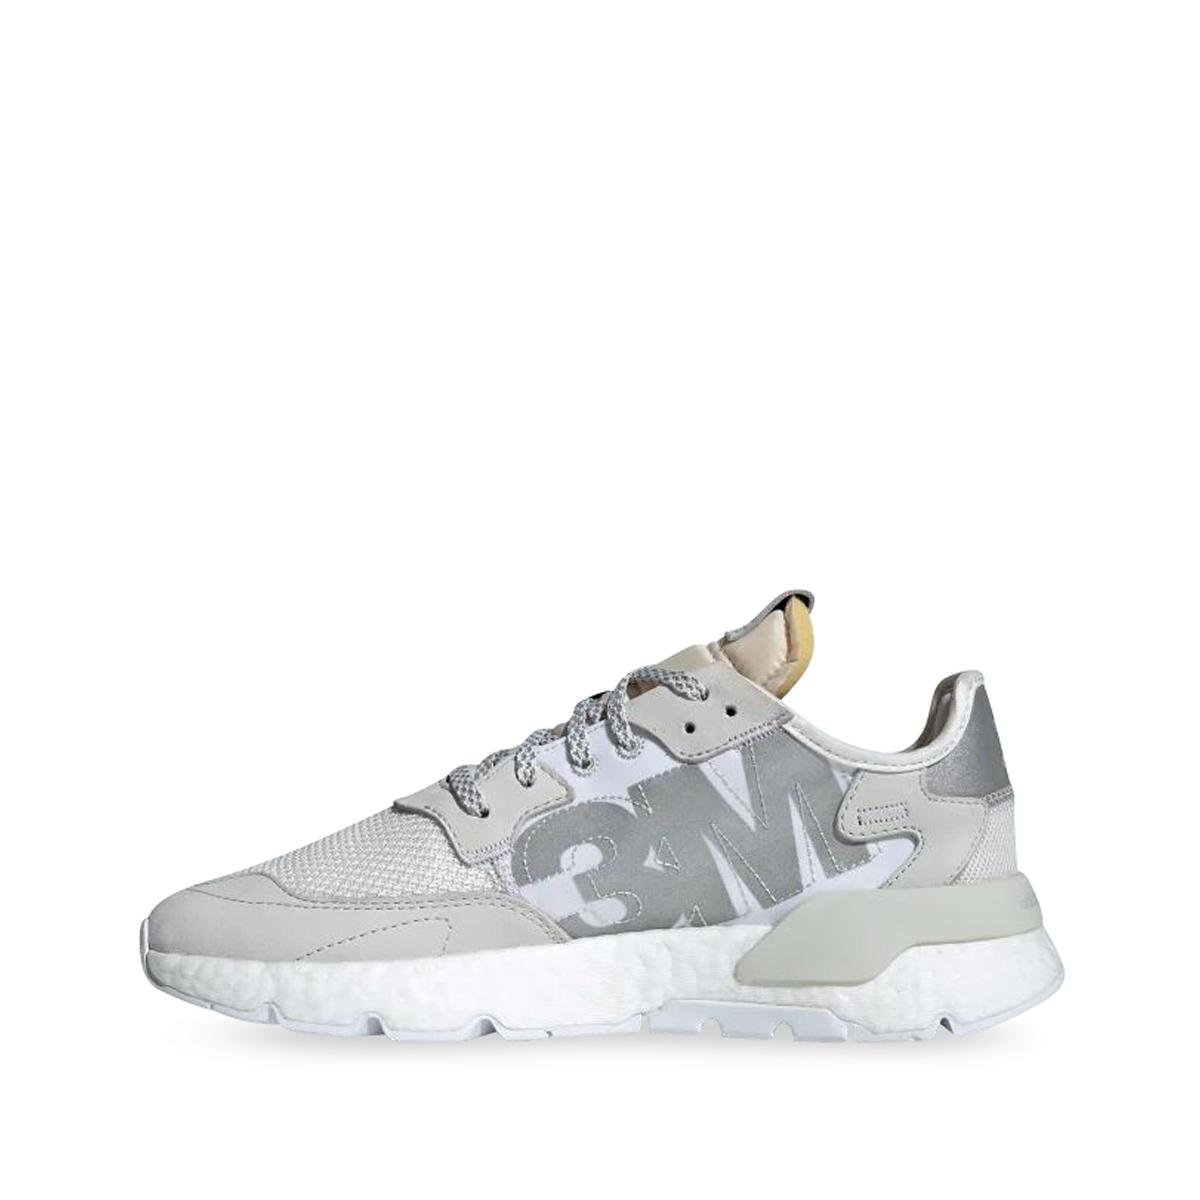 adidas Nite Jogger White Left